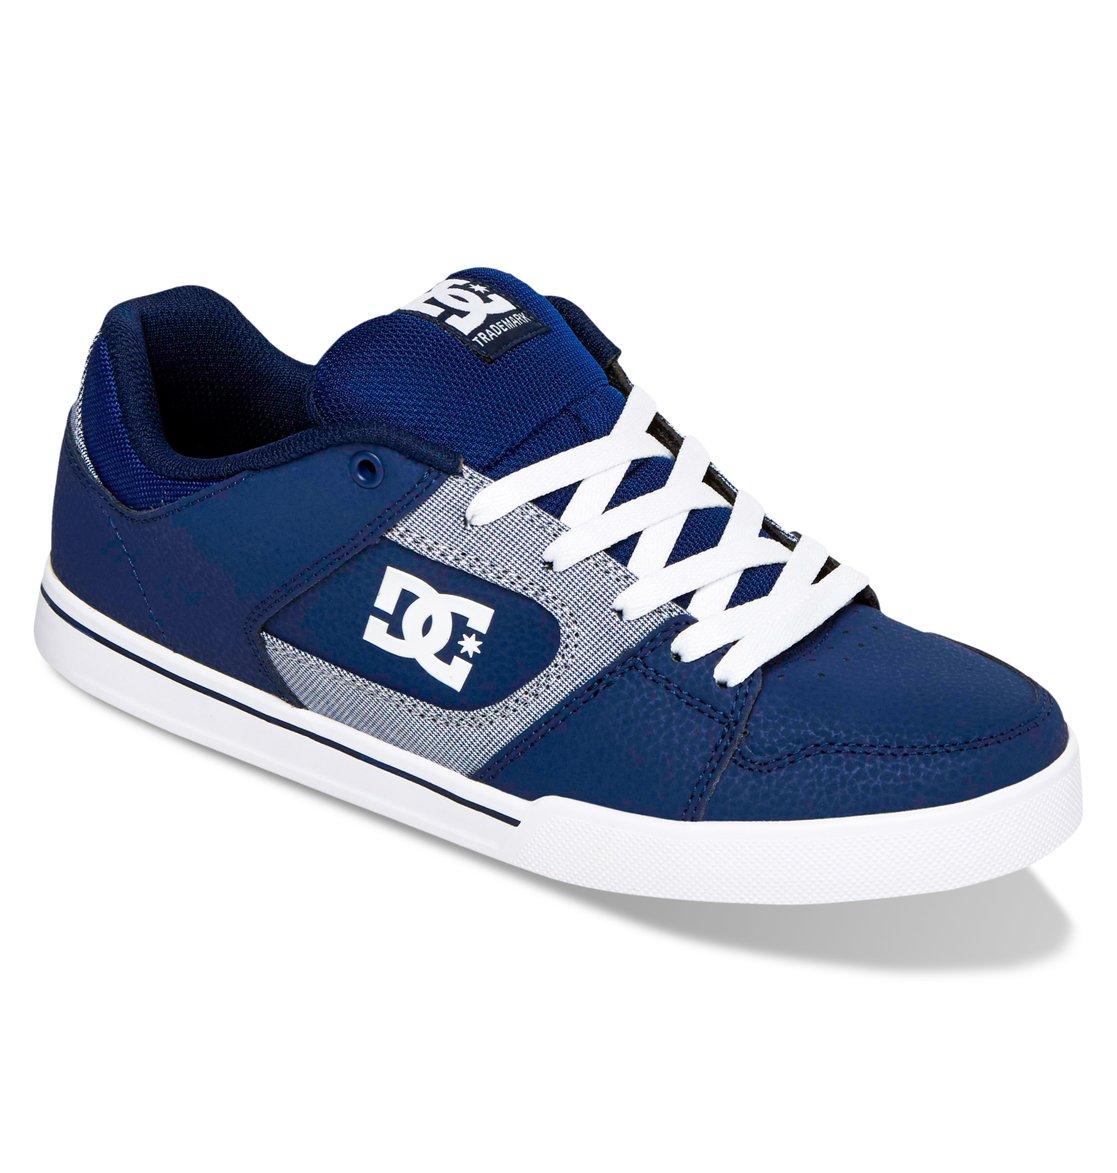 3b668ac759 1 BLITZ II ADYS100091 DC Shoes